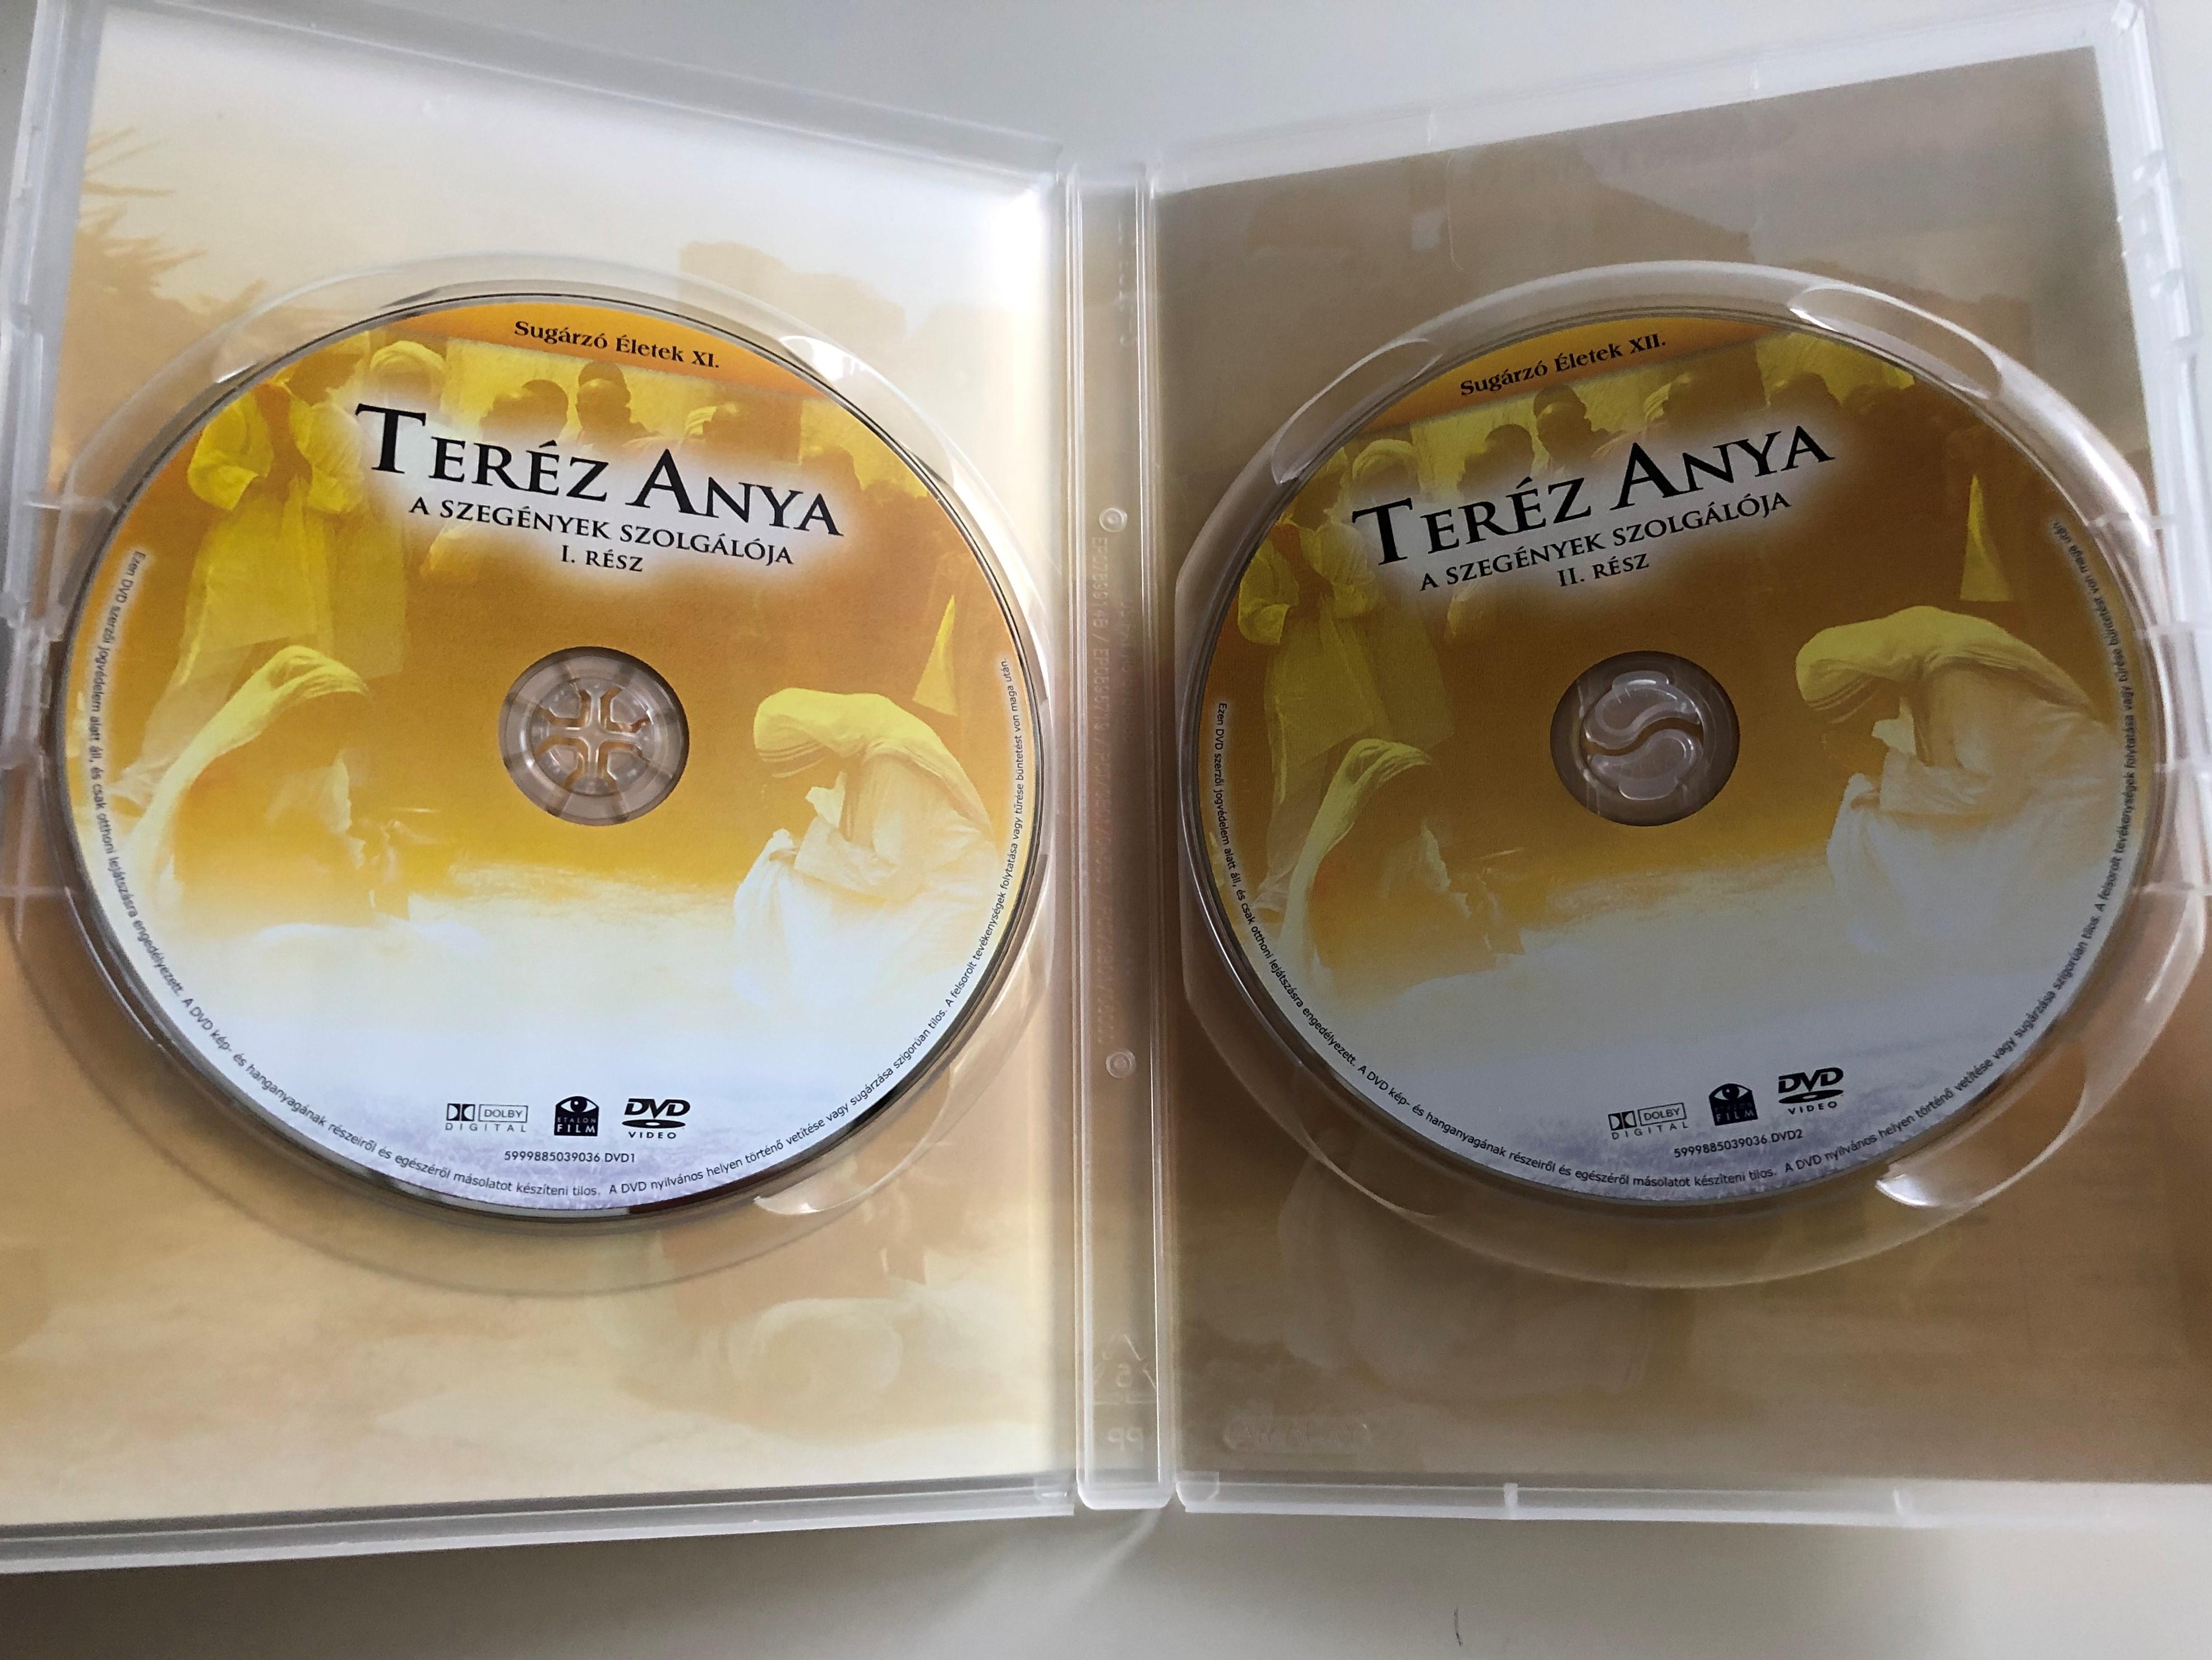 madre-teresa-part-i-ii-dvd-2003-ter-z-anya-a-szeg-nyek-szolg-l-ja-i-ii-directed-by-fabrizio-costa-starring-olivia-hussey-sebastiano-somma-michael-mendl-2-.jpg